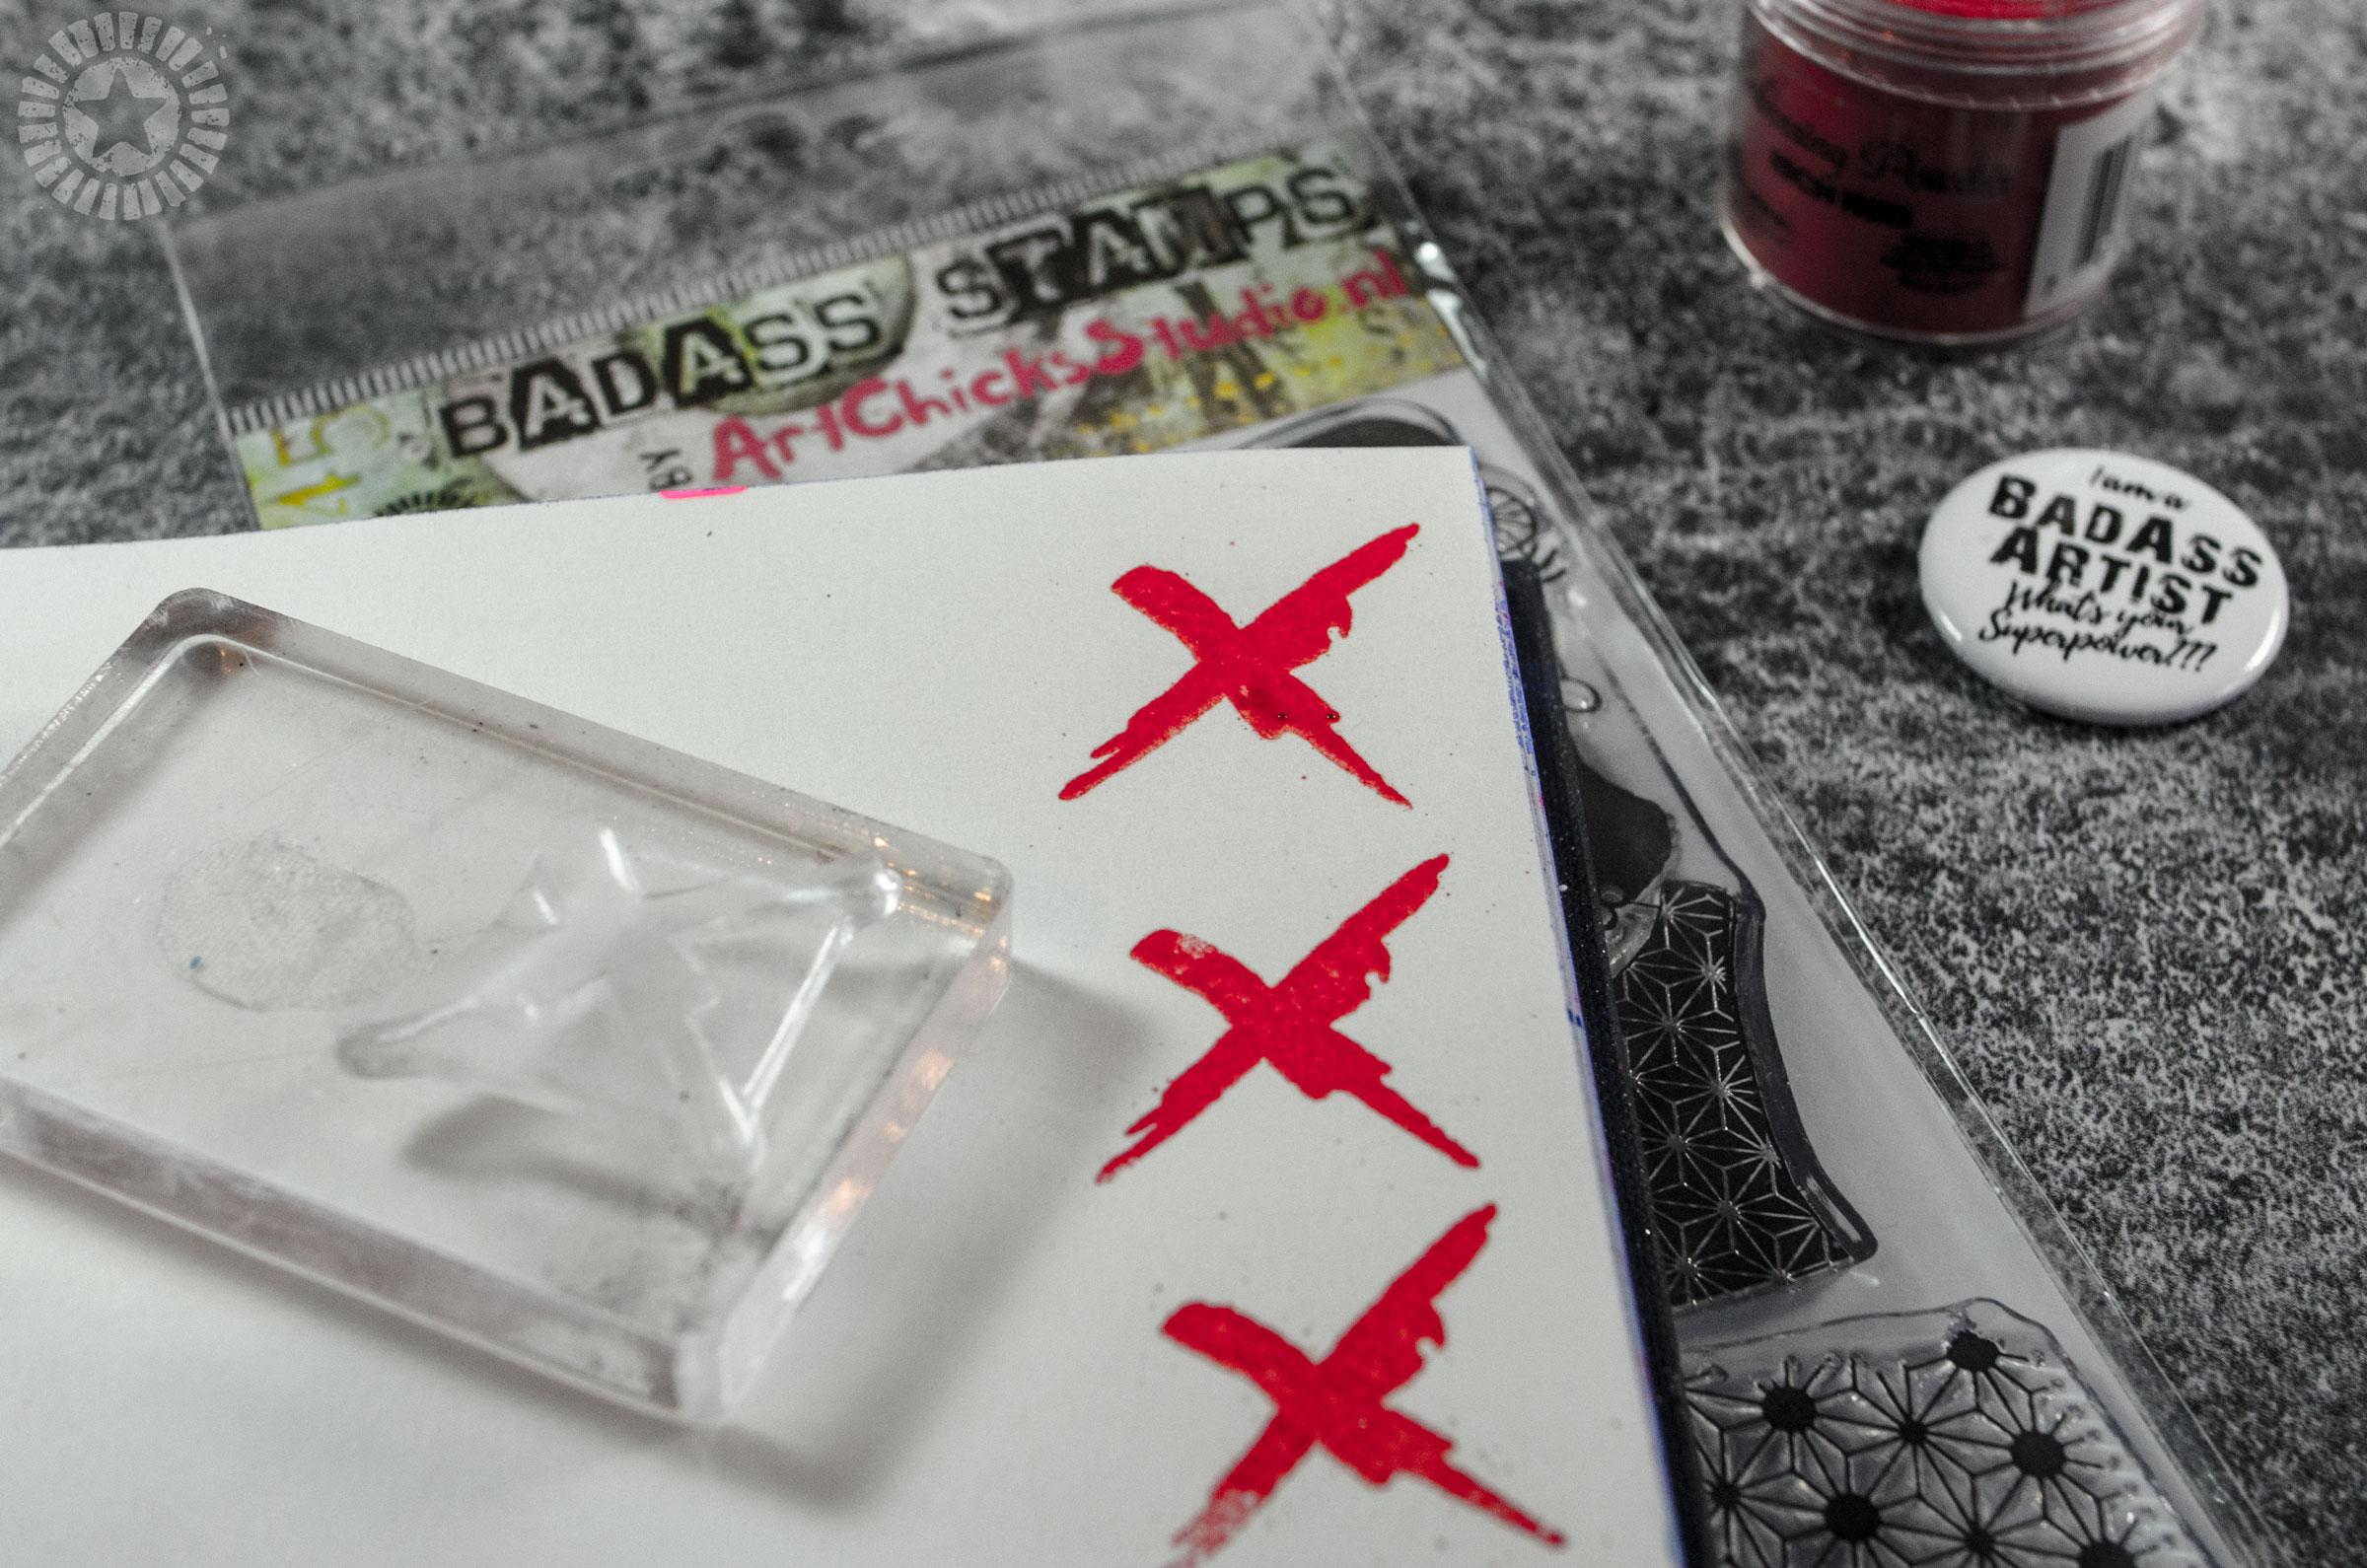 Badass stamps studio • Bloknote nl